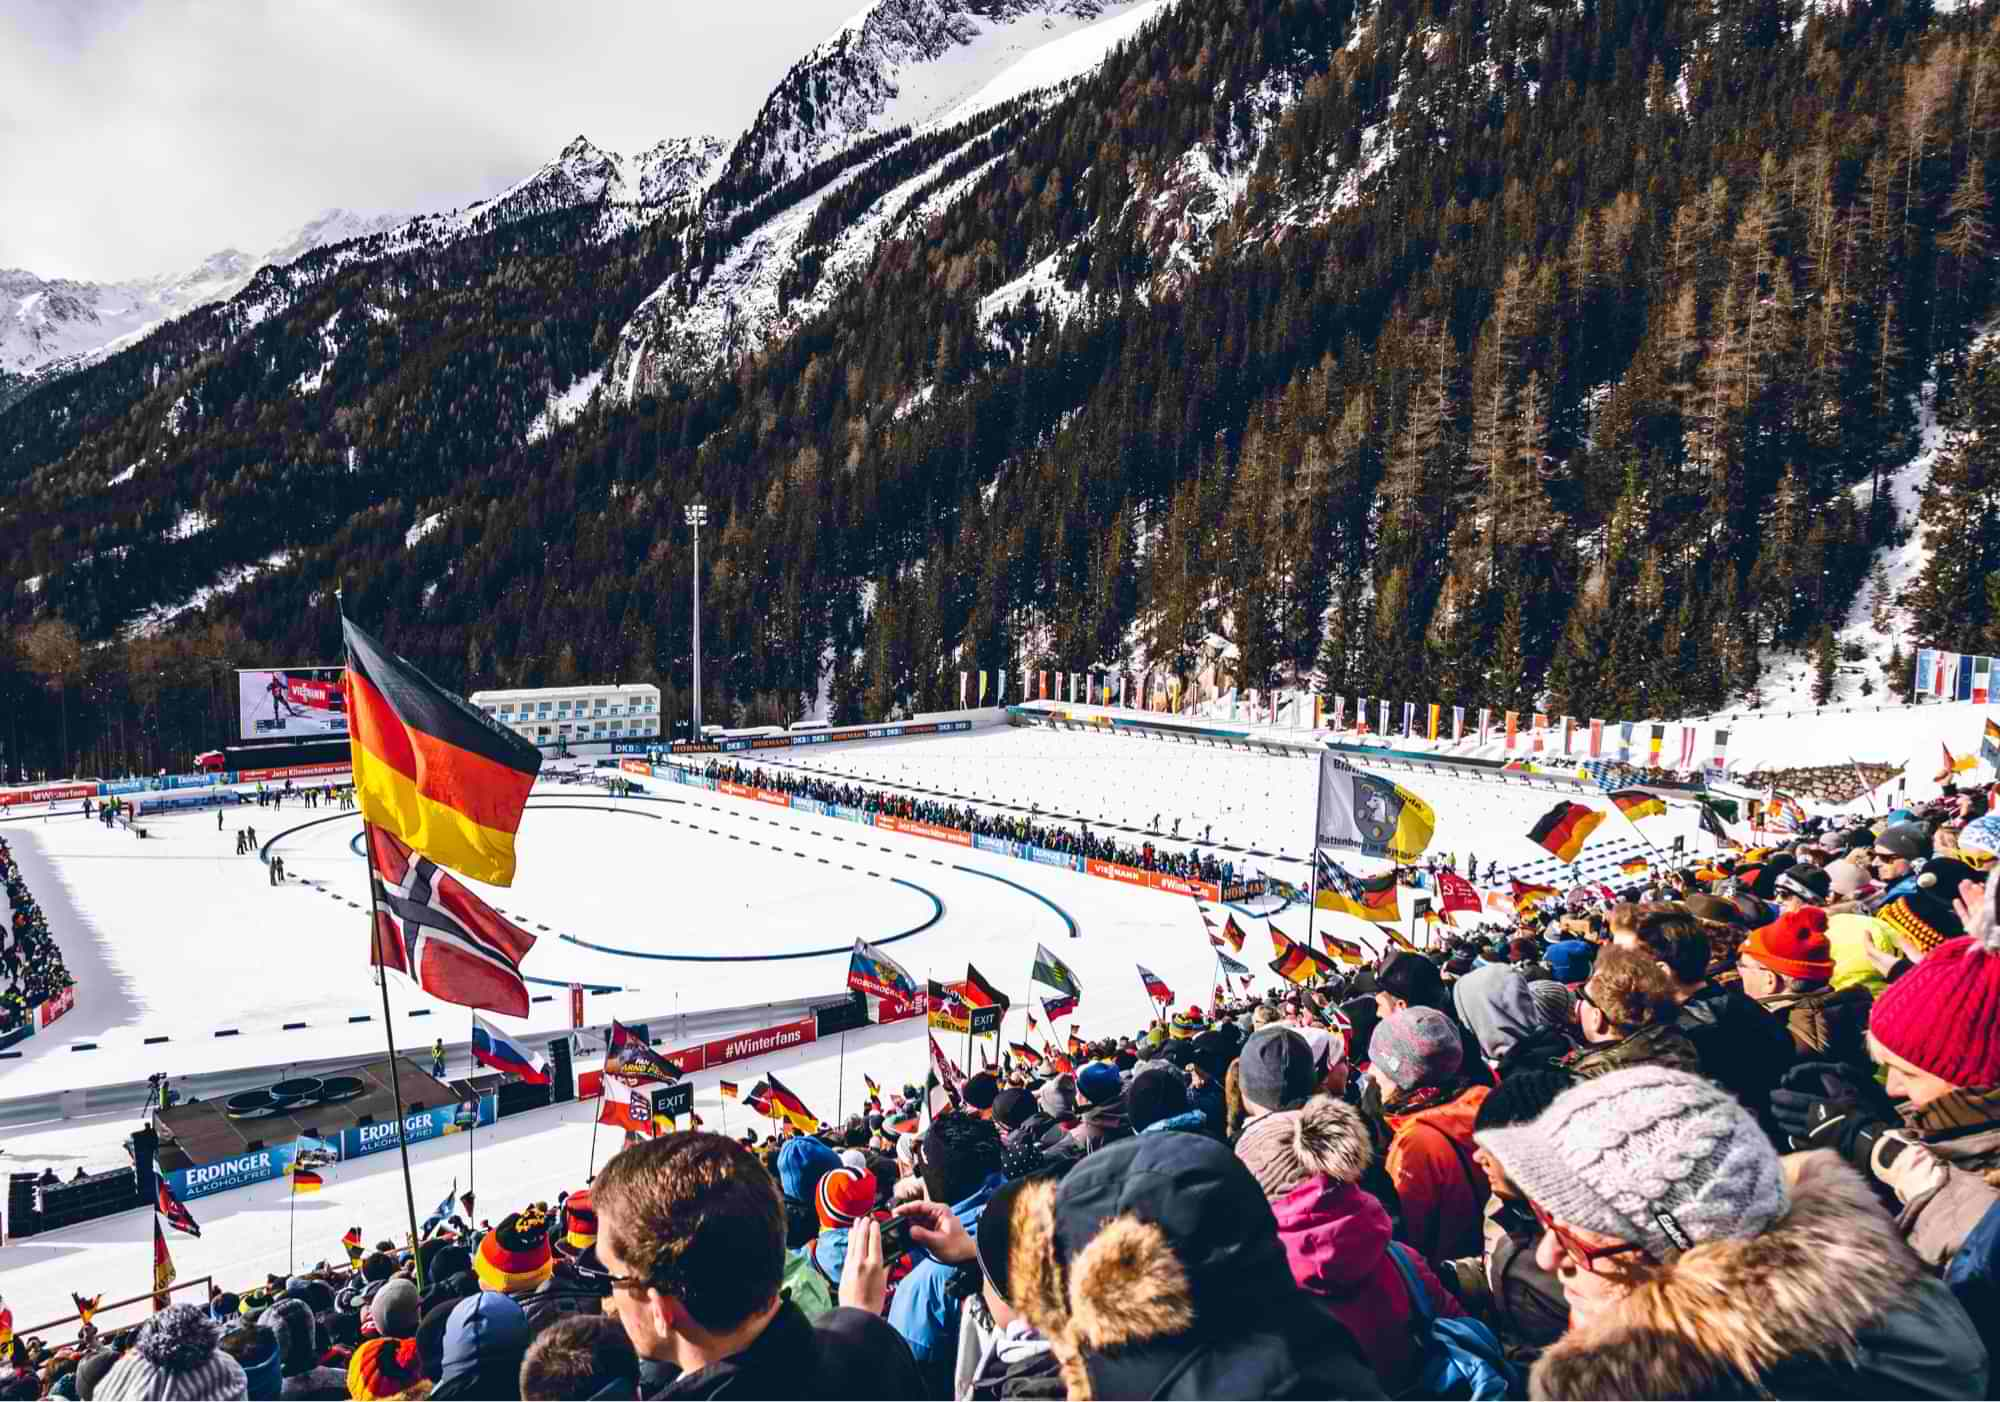 Crowded biathlon stadium in Italy